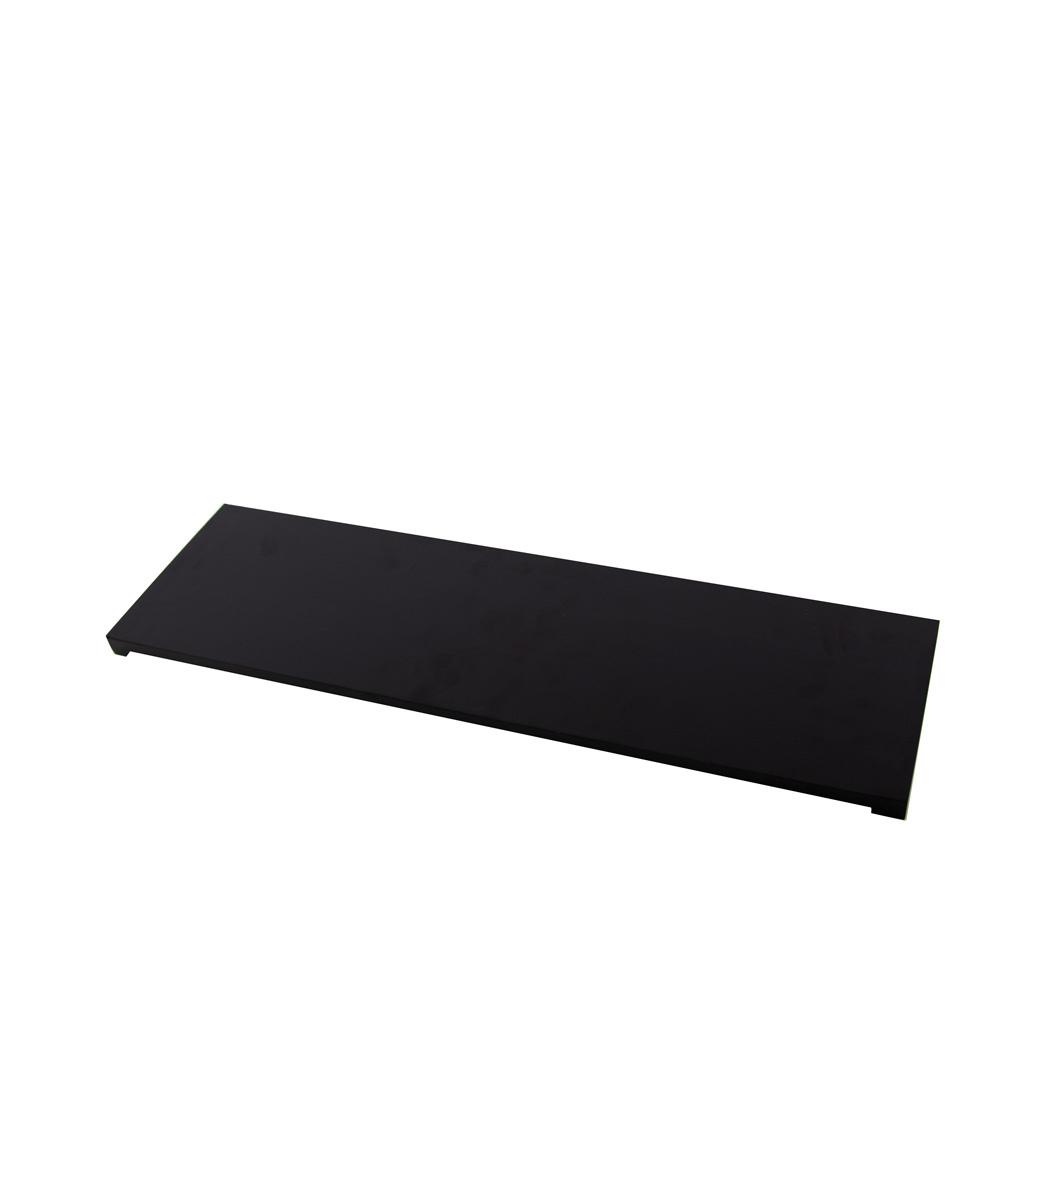 Wooden shelf - Black-2